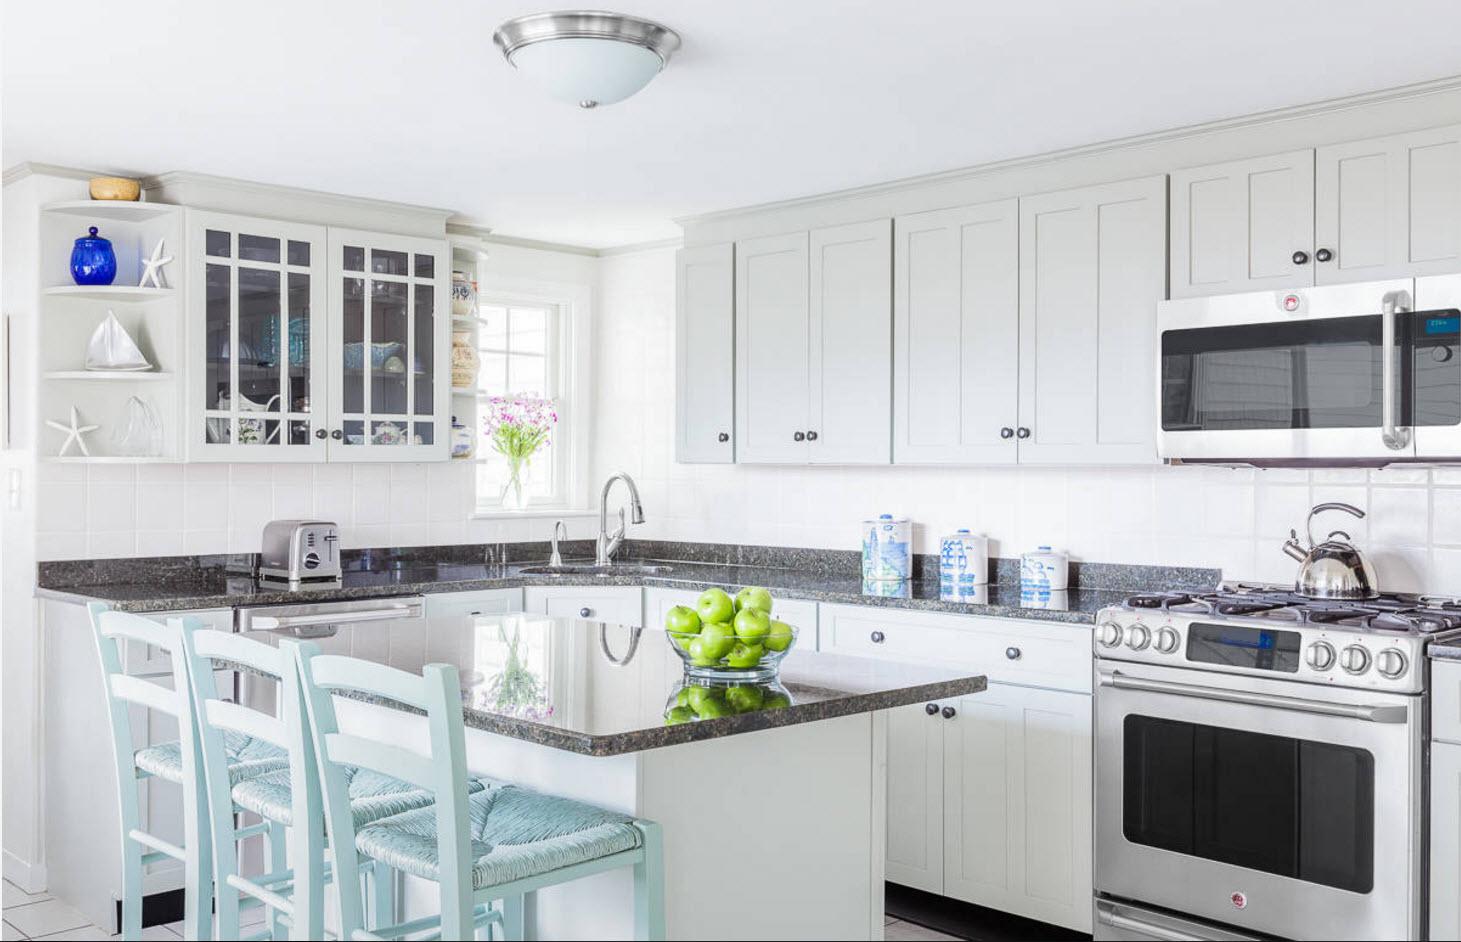 Angular Kitchen Layout Design Ideas 2017 Small Design Ideas